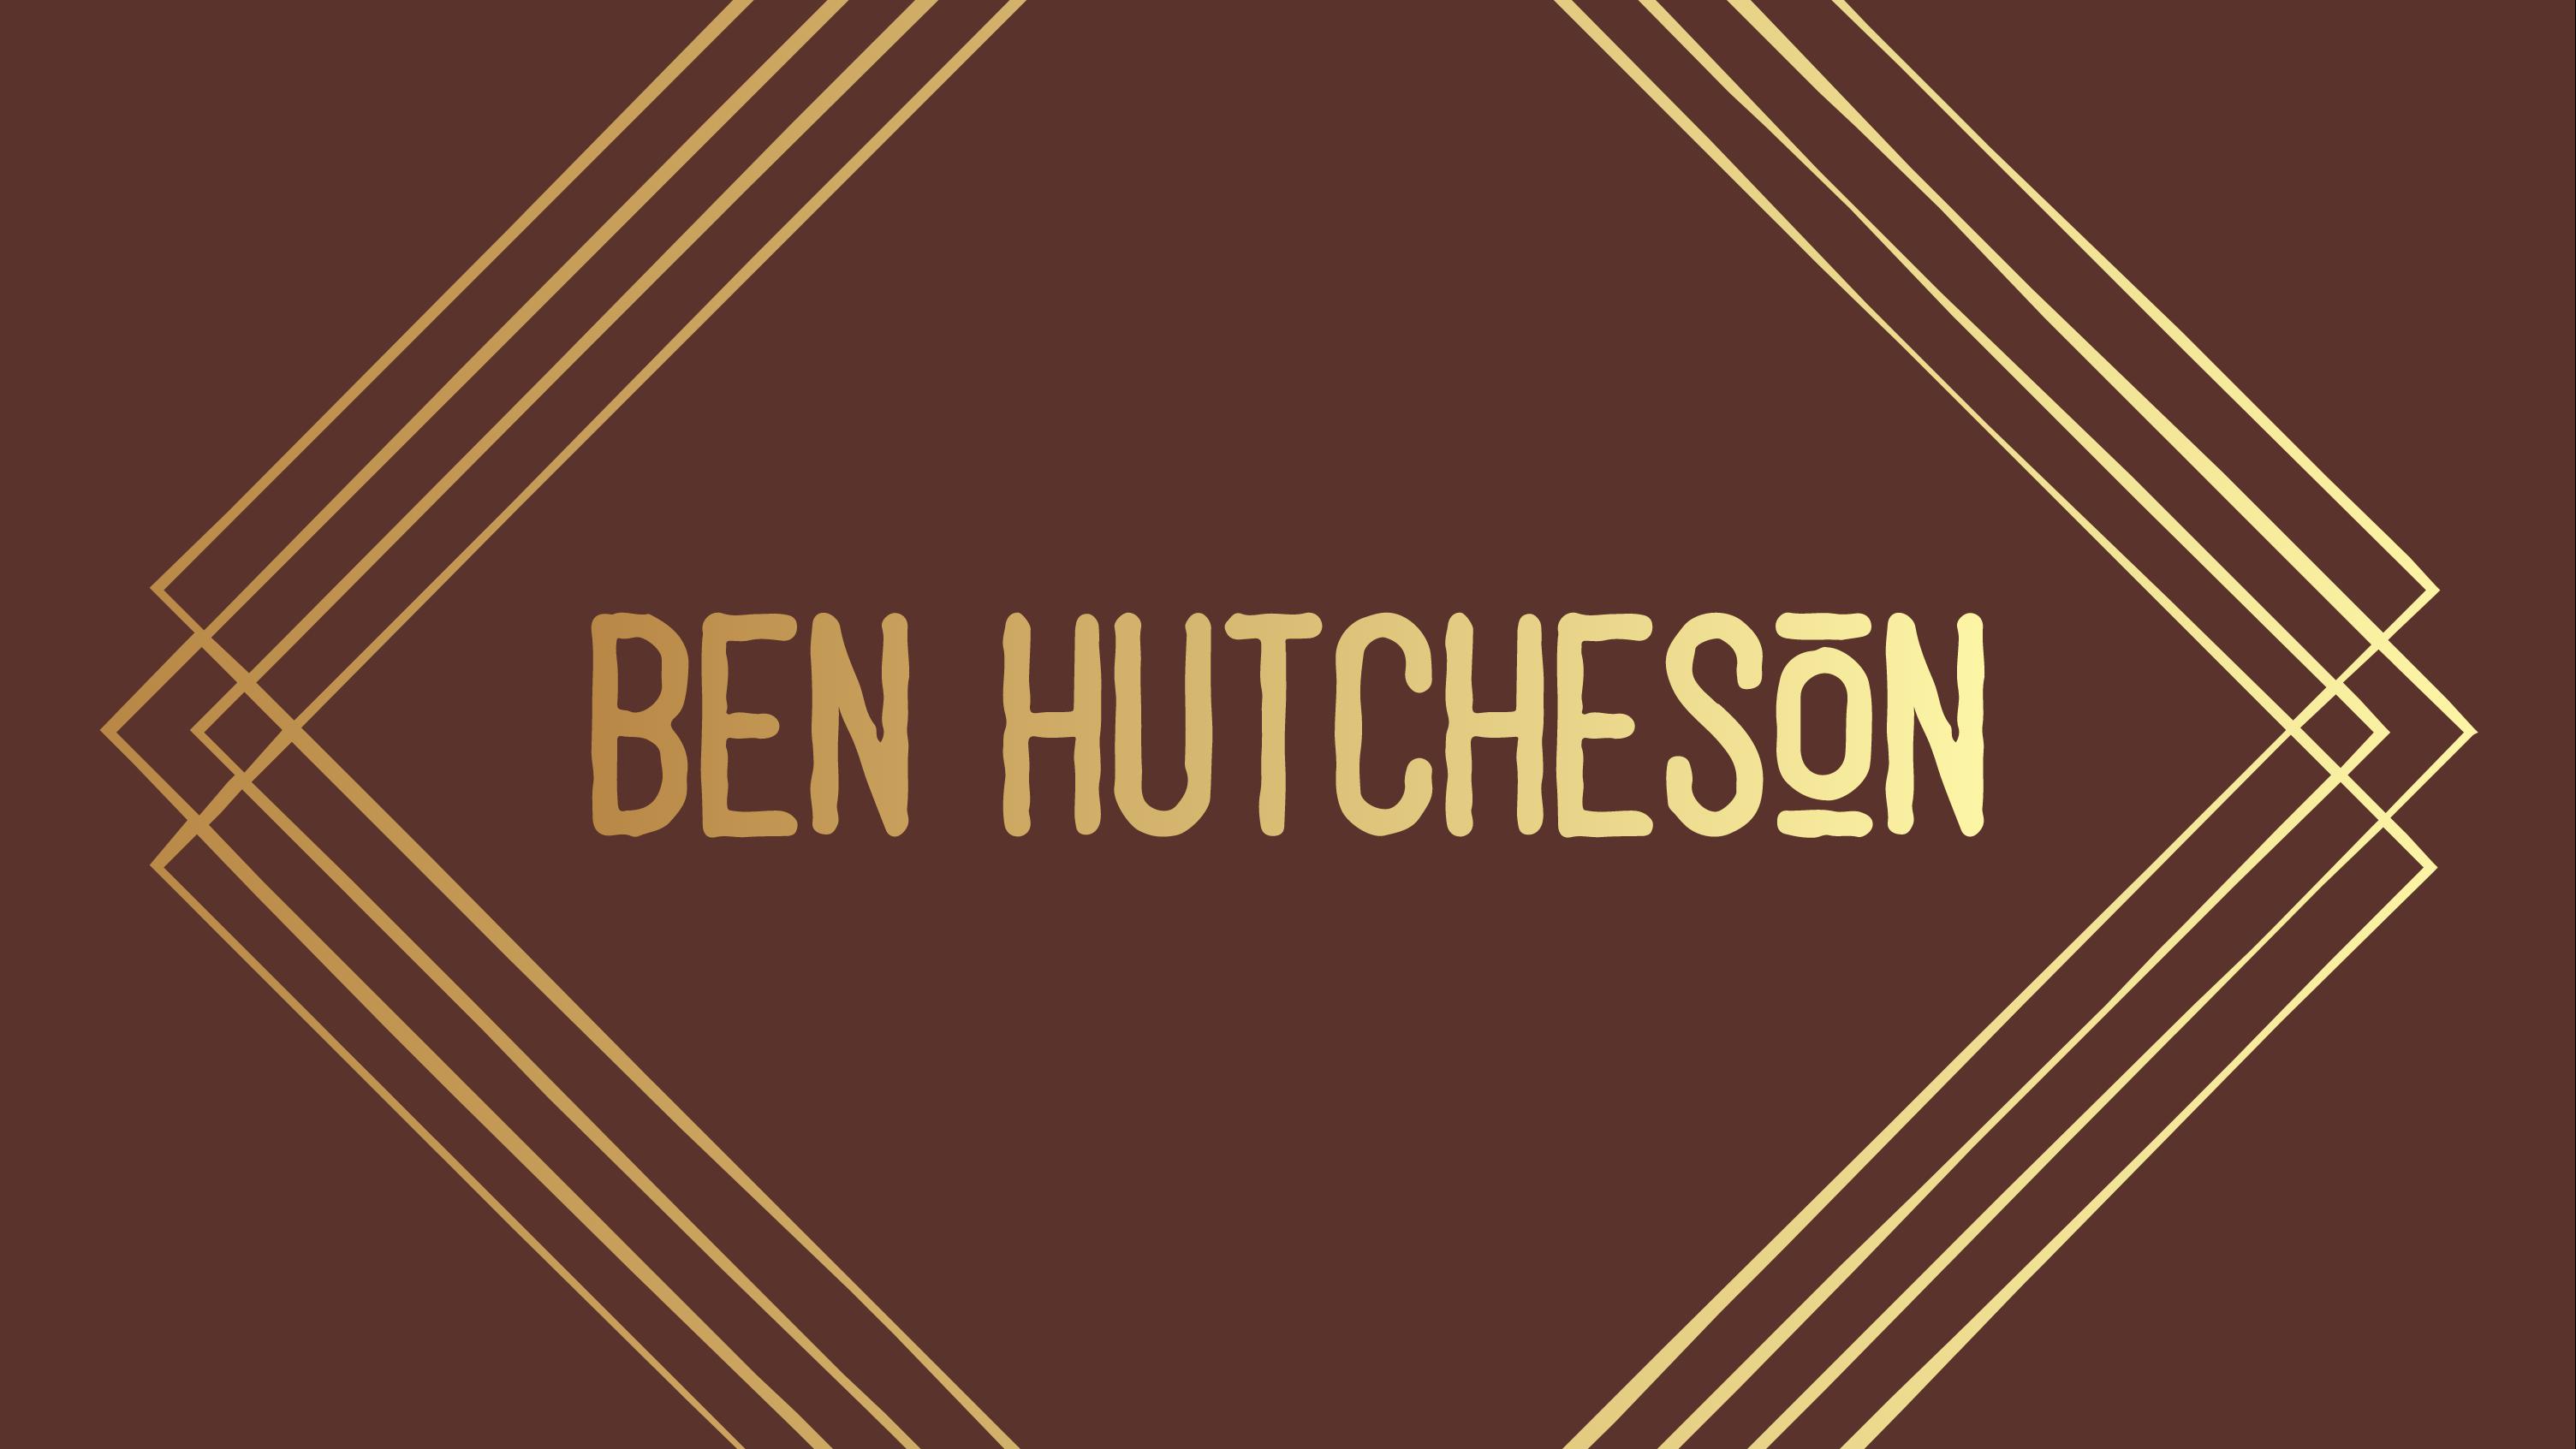 Ben Hutcheson + Nia Nicolls & Elizabeth Pickering